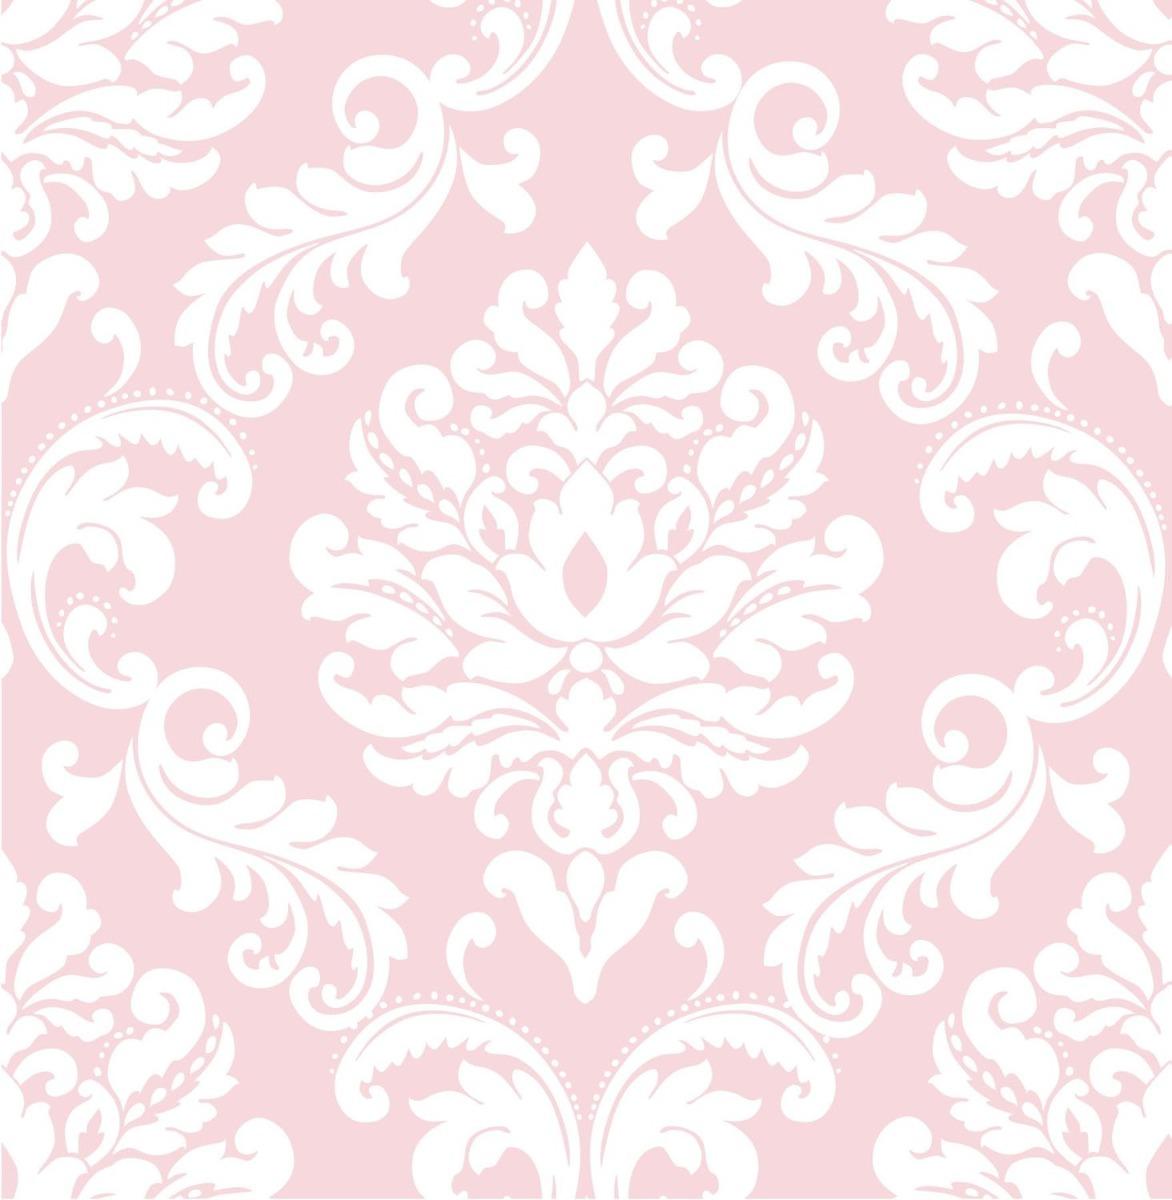 Papel tapiz dise o ariel rosa y blanco blakhelmet nsp - Papel pared blanco ...